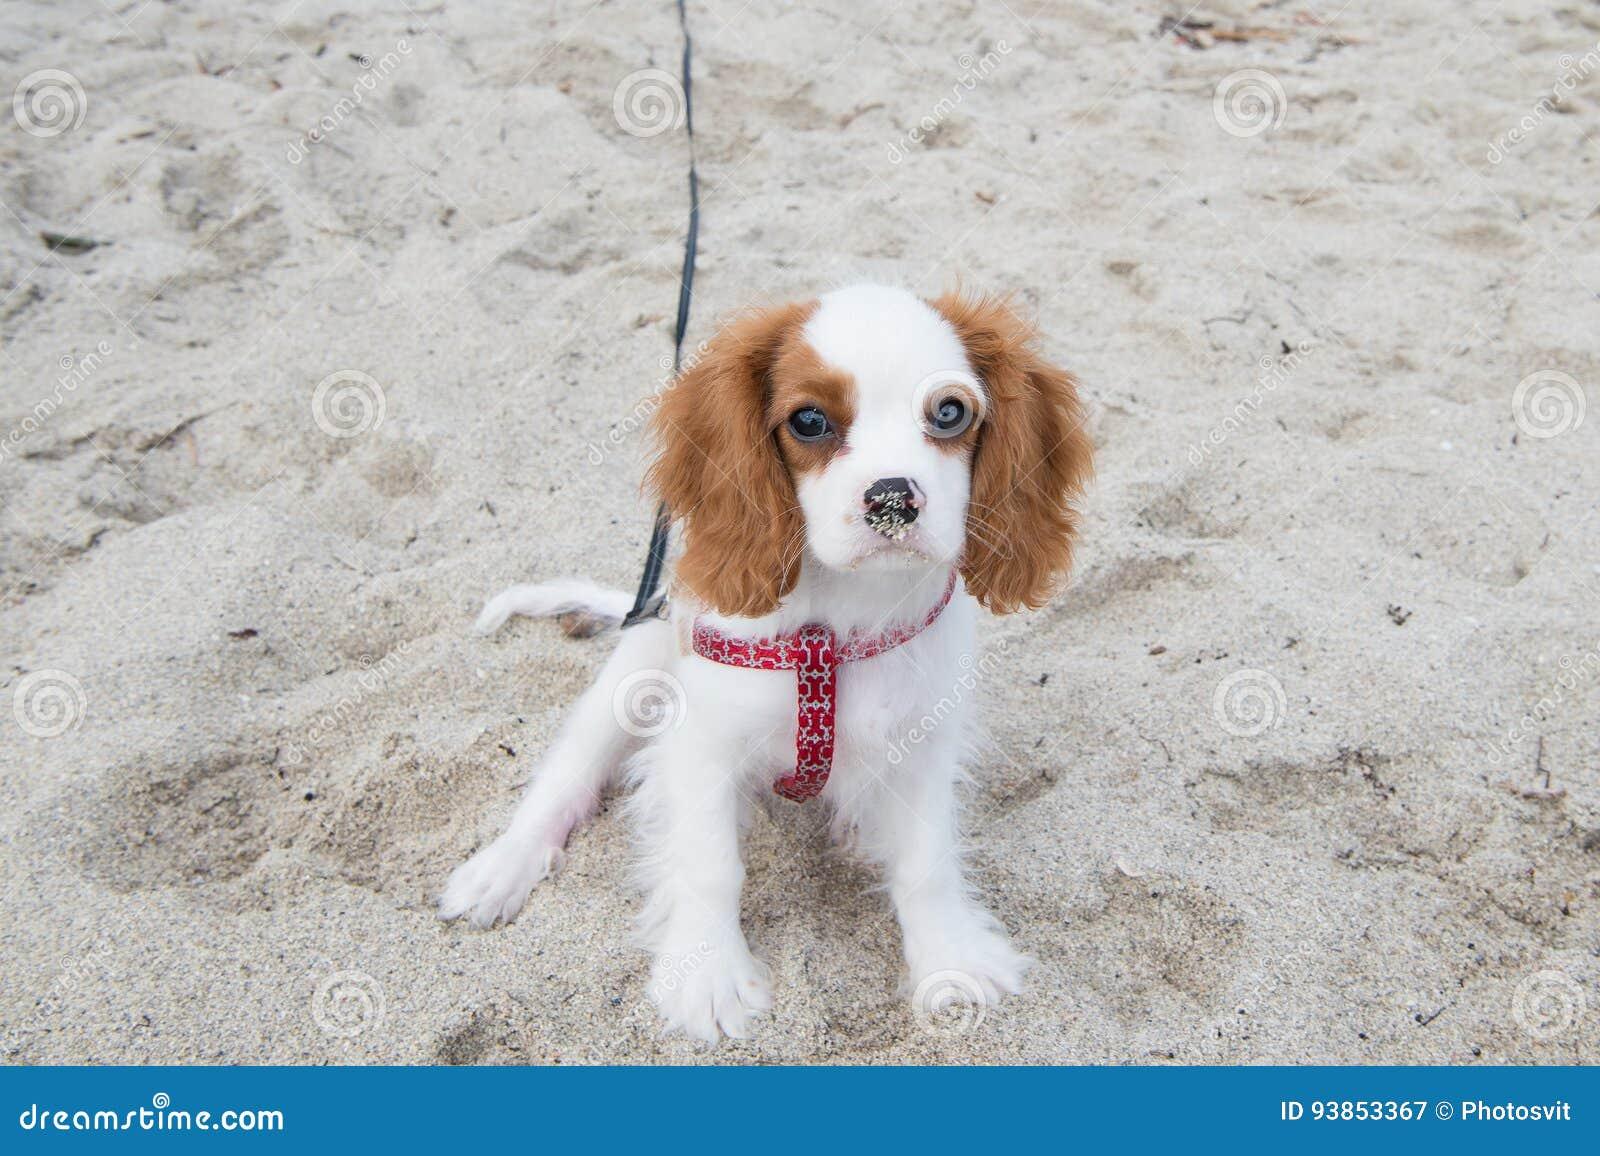 Spanielwelpe Hunde- oder Kavalierkönigs Charles